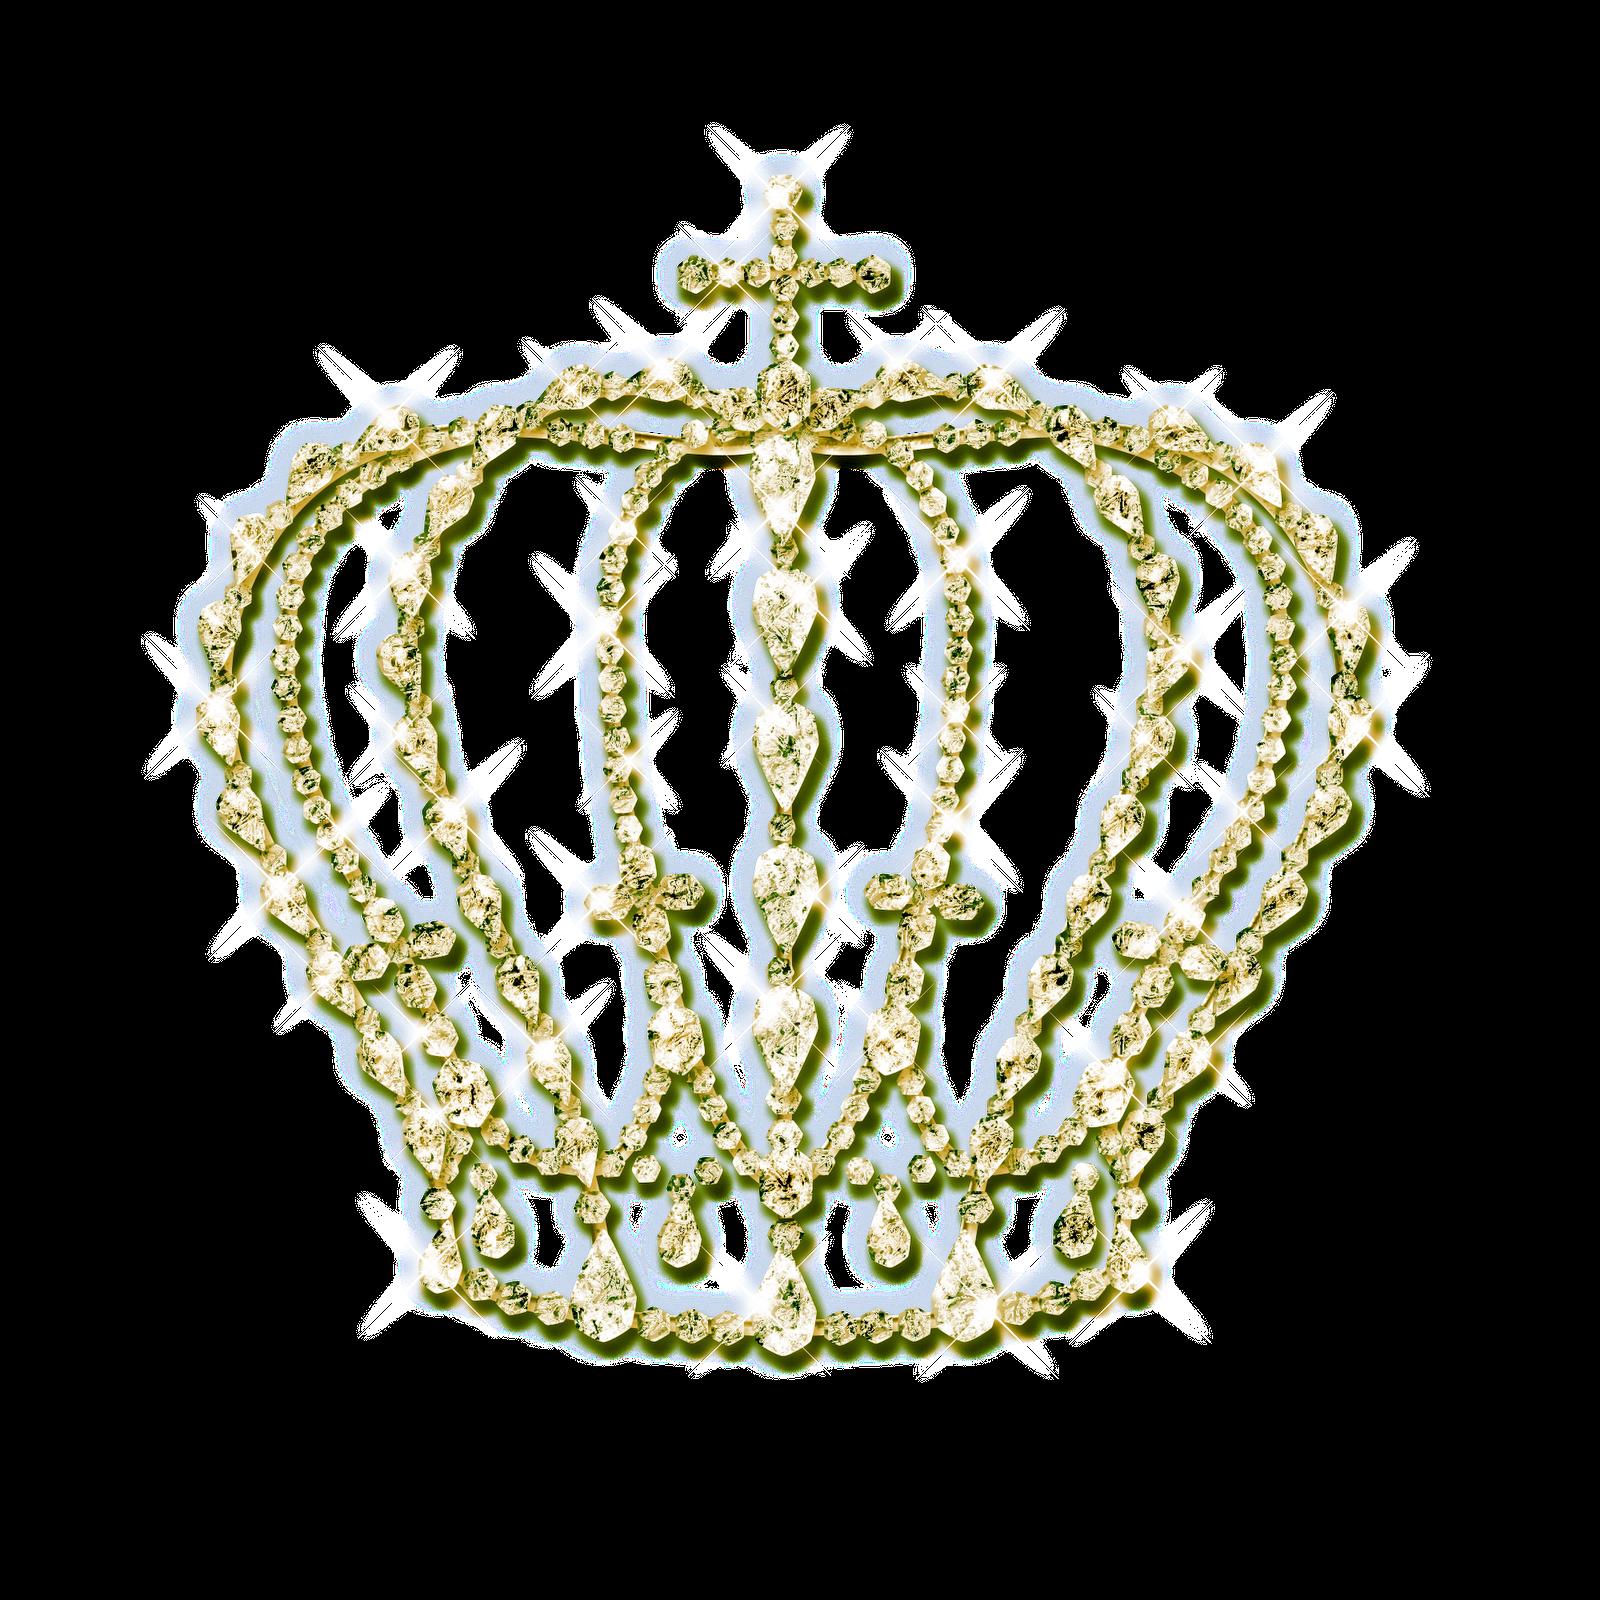 diademas coronas png diamantes